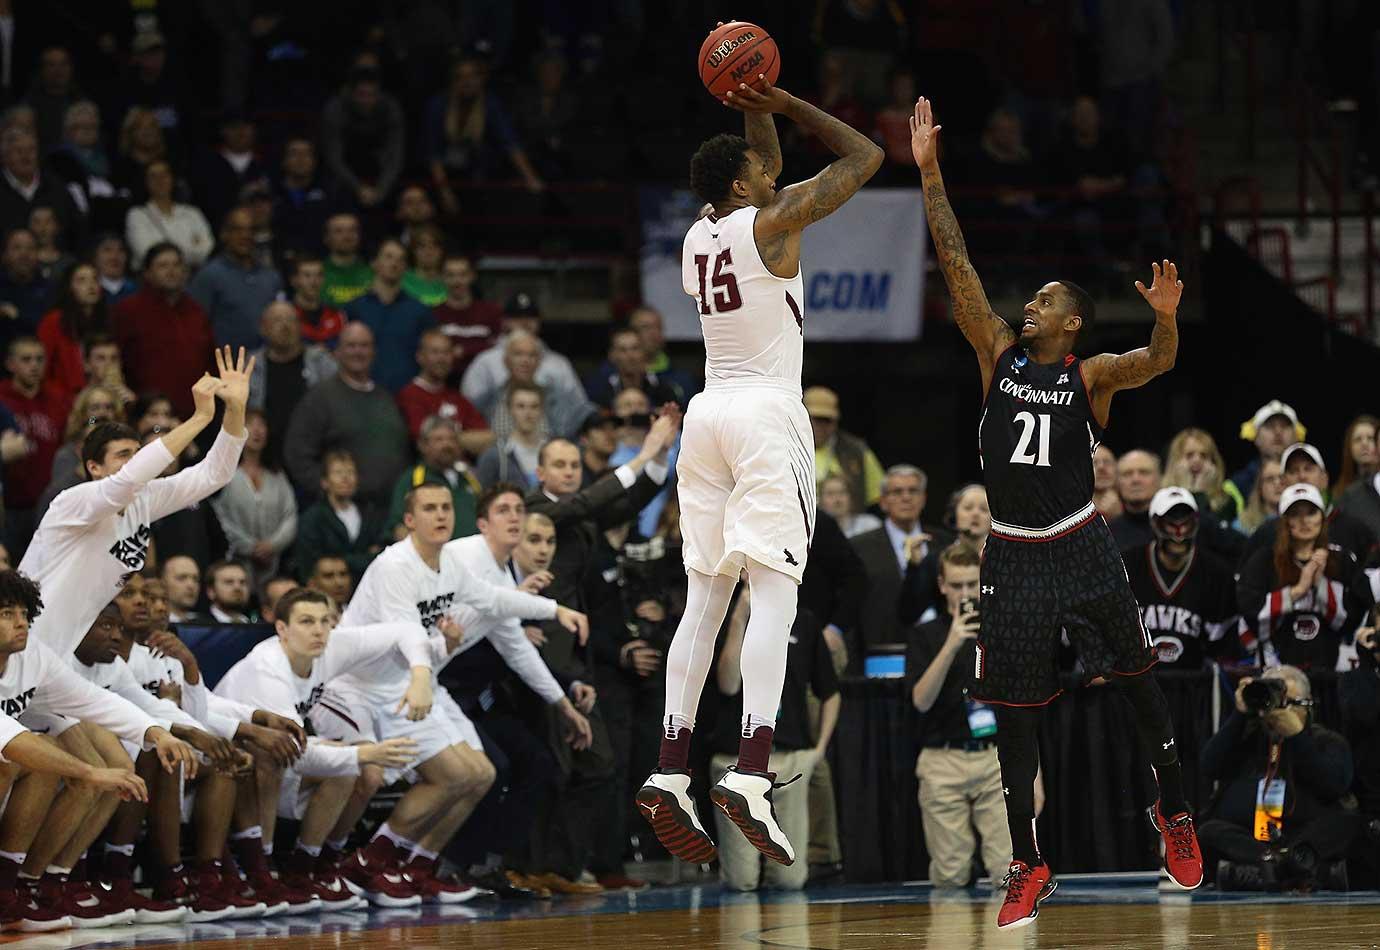 Isaiah Miles of the Saint Joseph's Hawks scores the game-winning basket against Farad Cobb of Cincinnati .